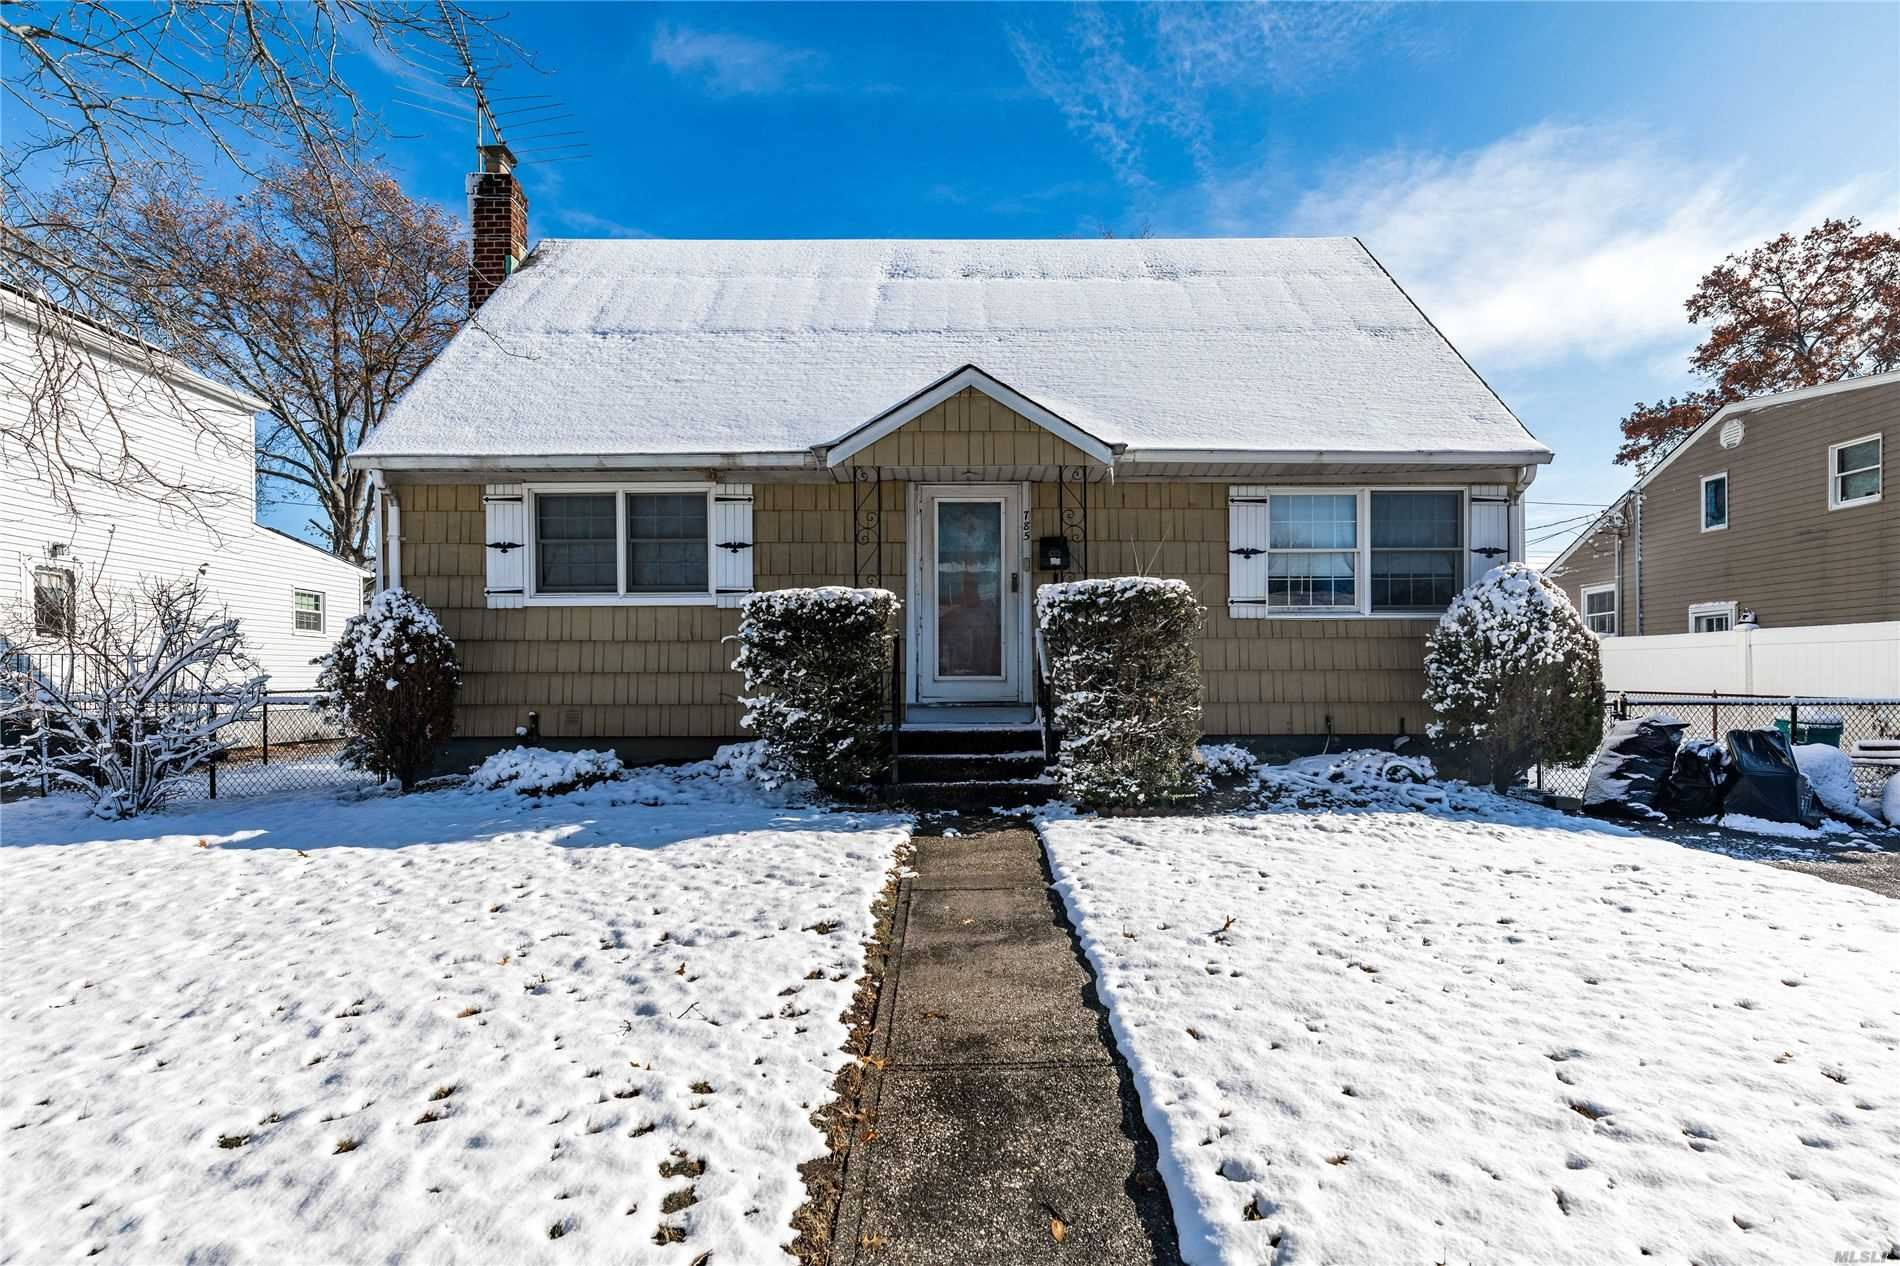 785 Flowerdale Drive, Seaford, NY 11783 - MLS#: 3184136